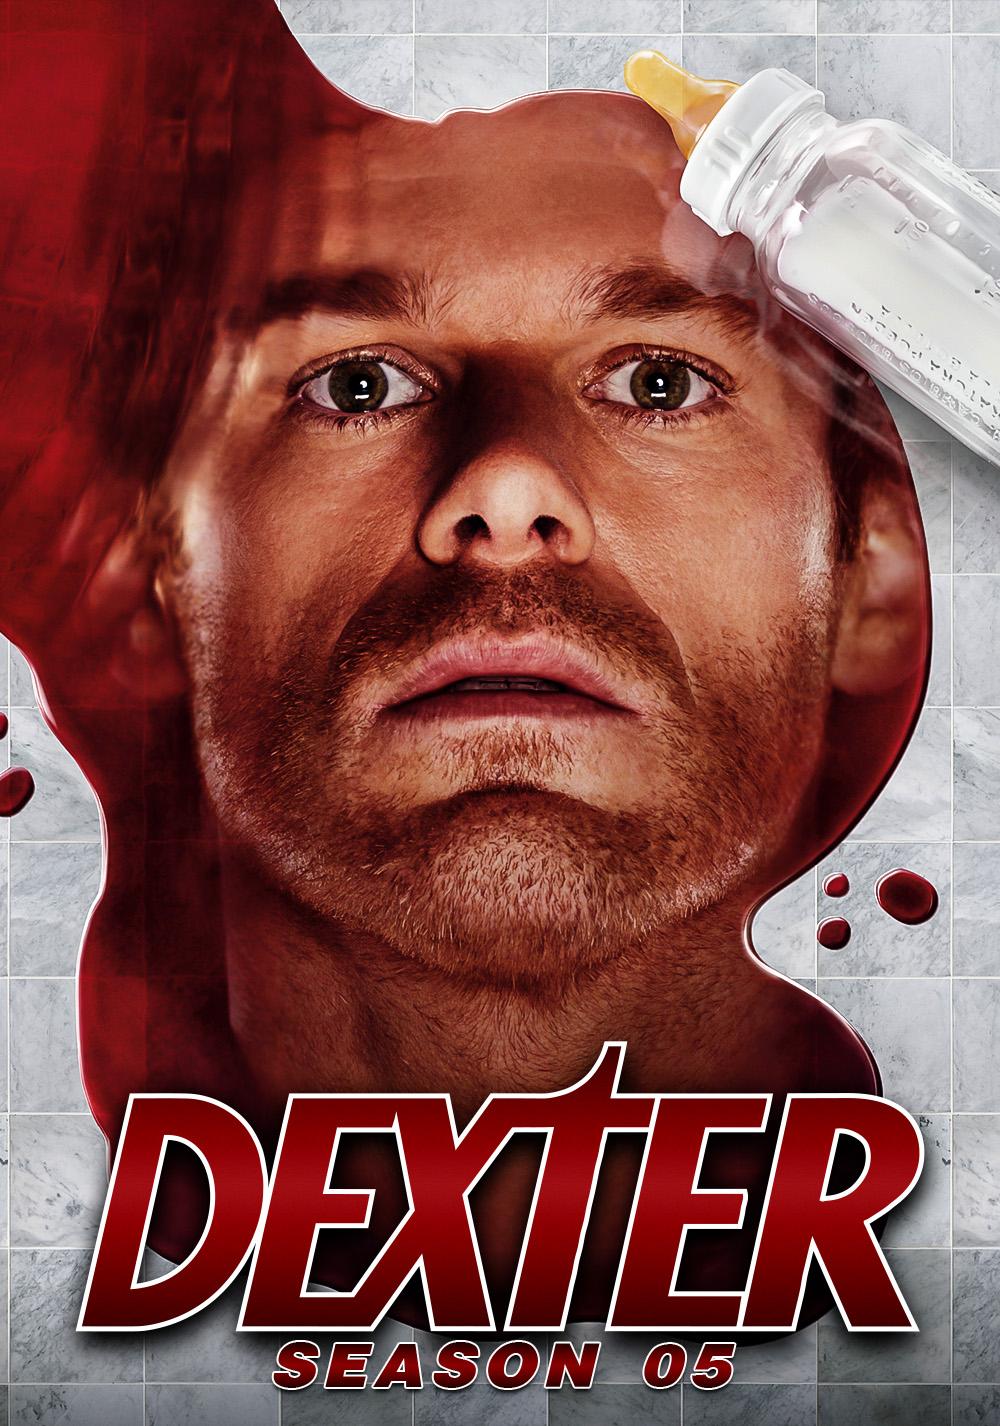 Dexter|Colección 1-8|Latino-Ingles|1080p|96/96|x265 10bit|+ Soundtracks  Season05-poster